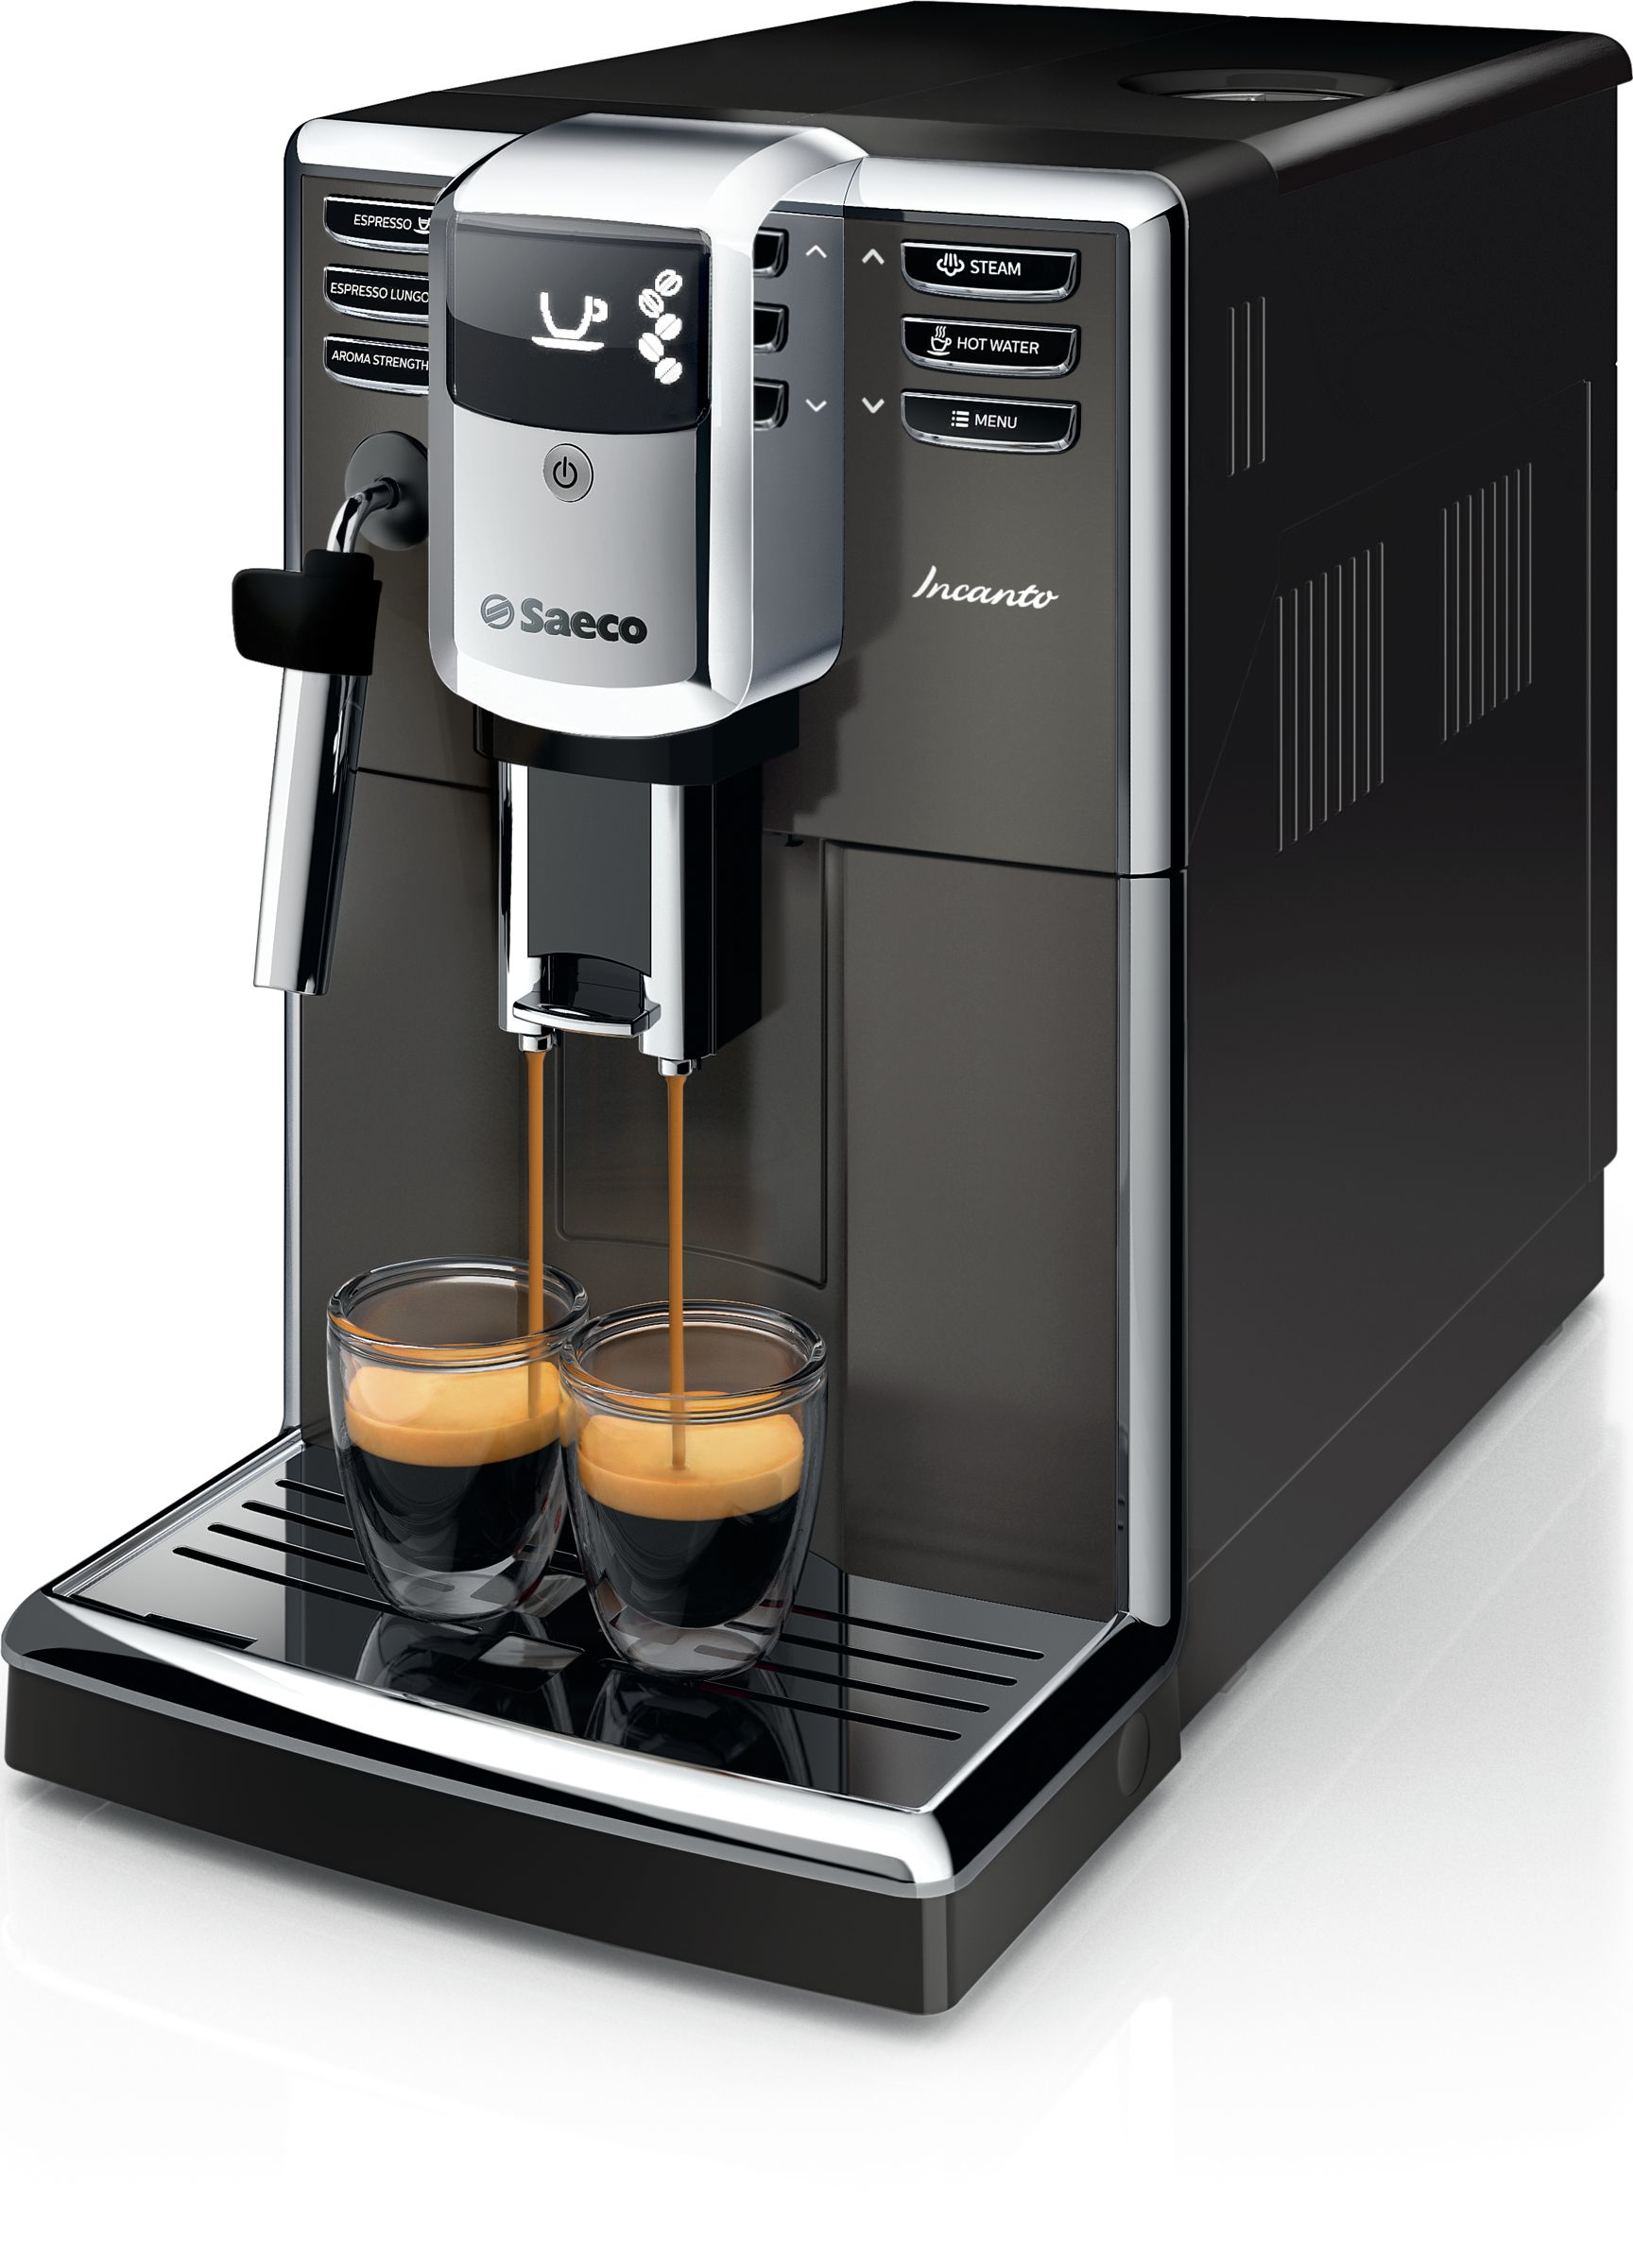 Saeco Incanto HD8913/11 Kaffeevollautomat 1,8l 250g Keramikmahlwerk für 545,00 Euro